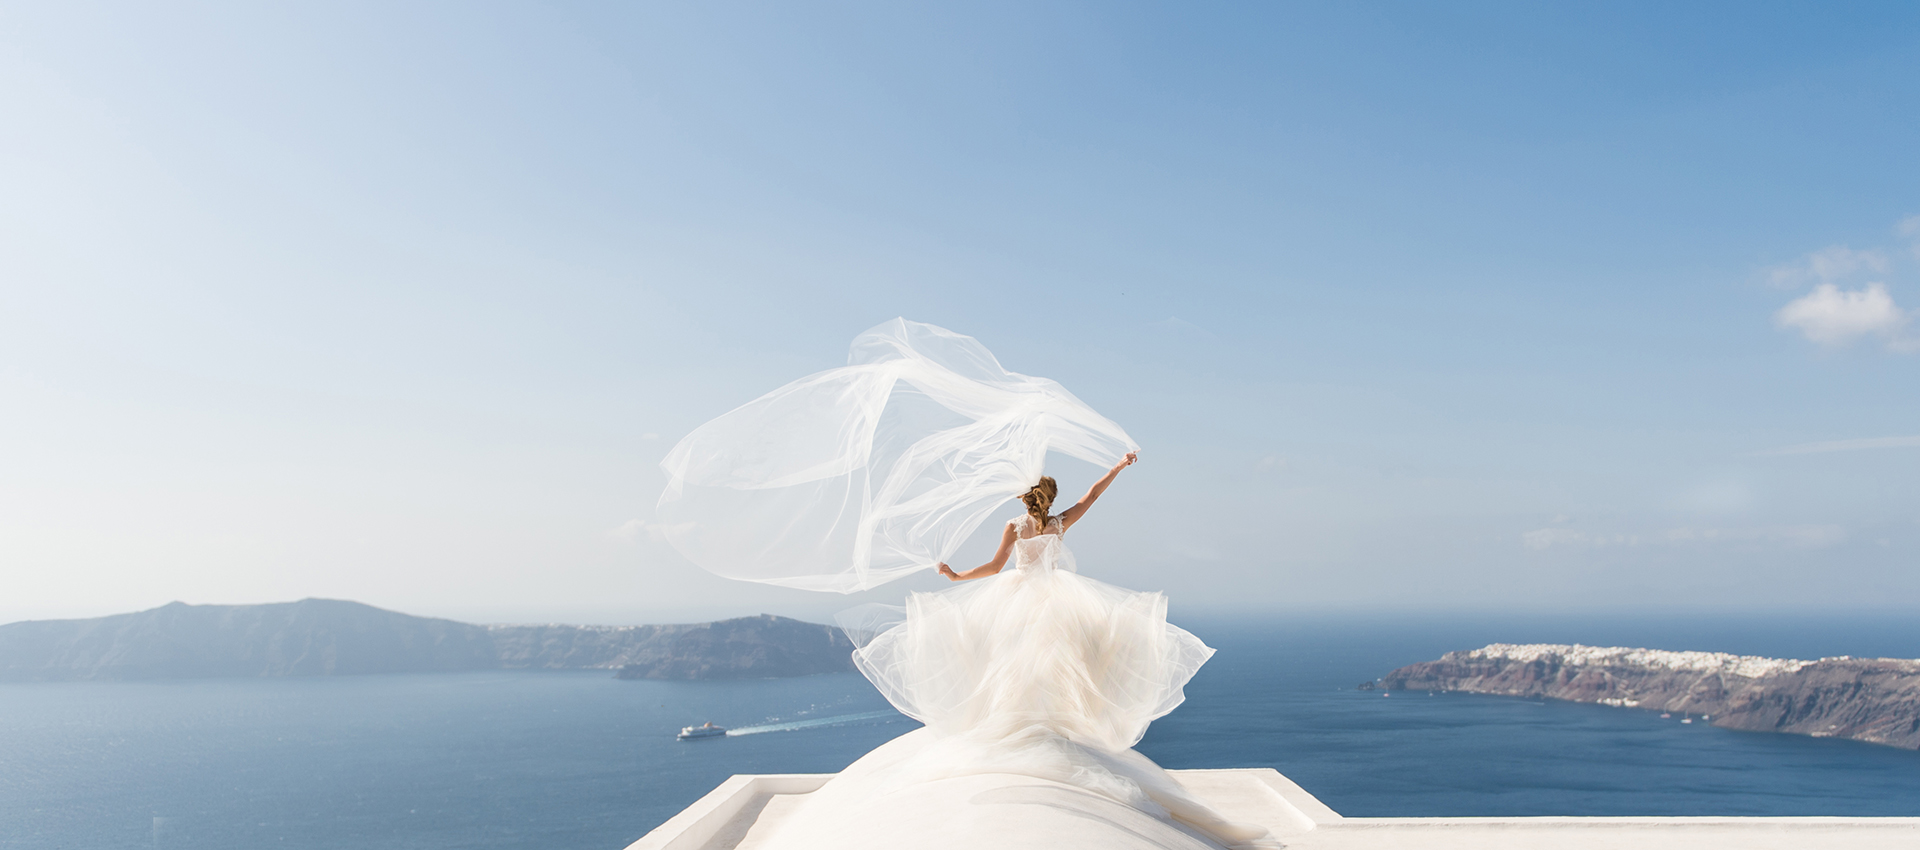 October Wedding in Santorini - StudioPhosart